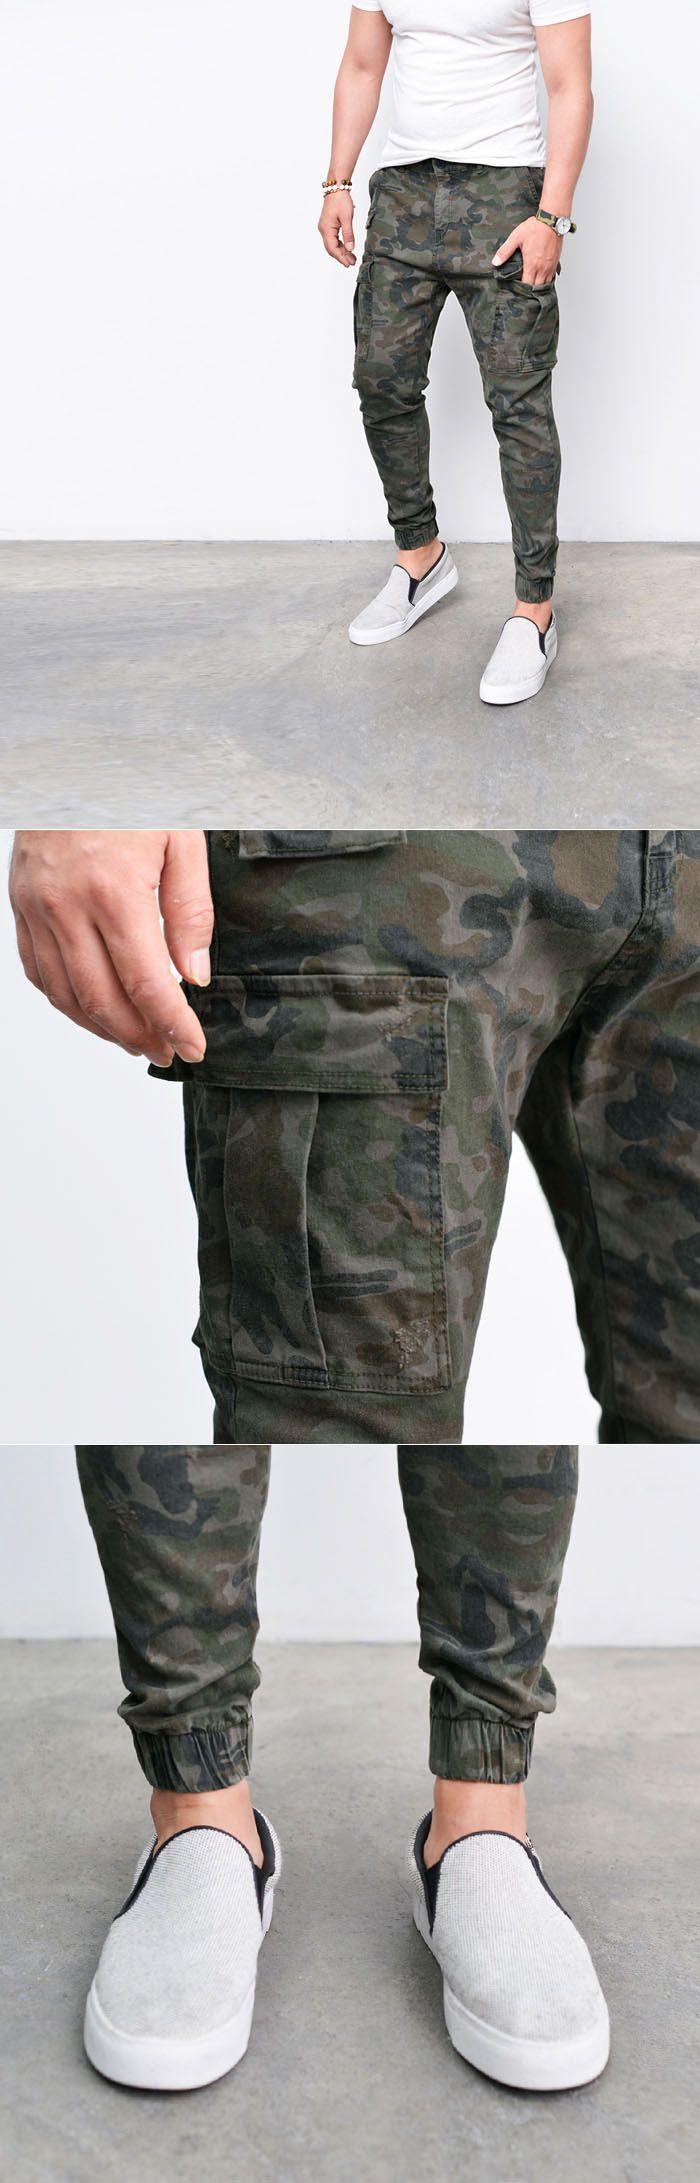 Camouflage Semi Cargo Biker Jogger-Pants 192 - GUYLOOK